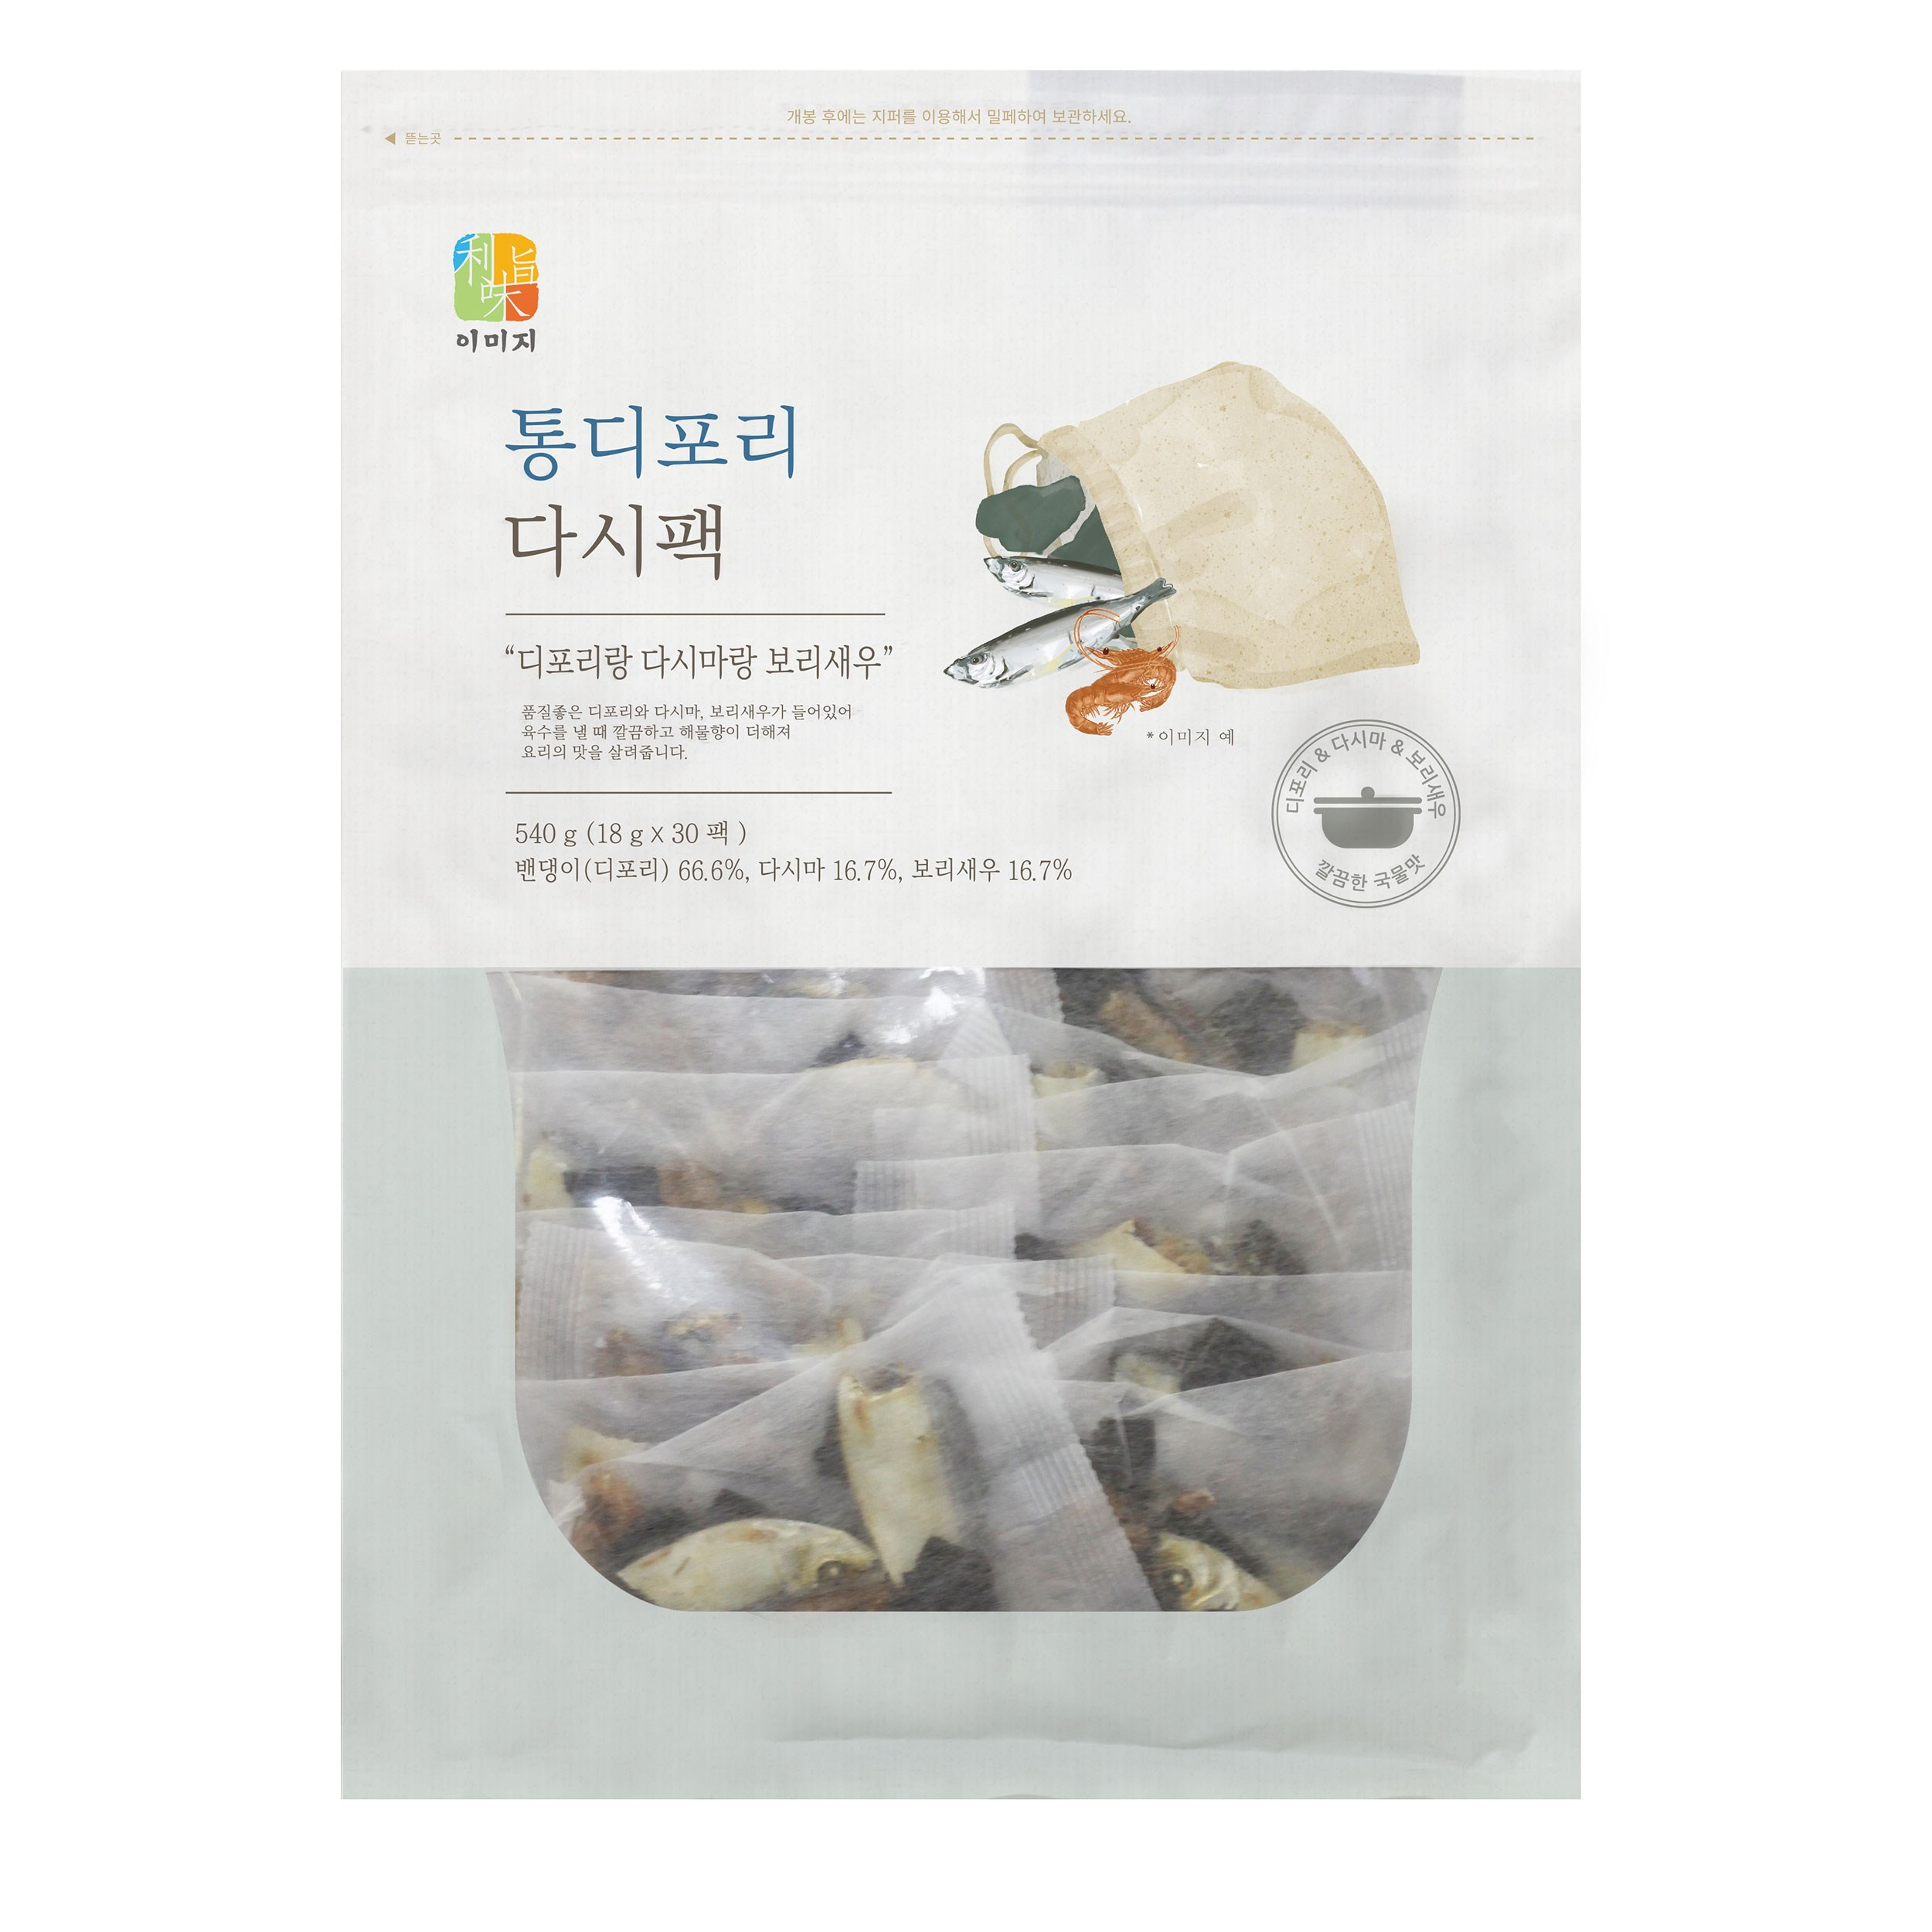 [Gold box] 석하 해물맛 육수진한 통디포리다시팩, 30개, 18g - 랭킹8위 (10890원)